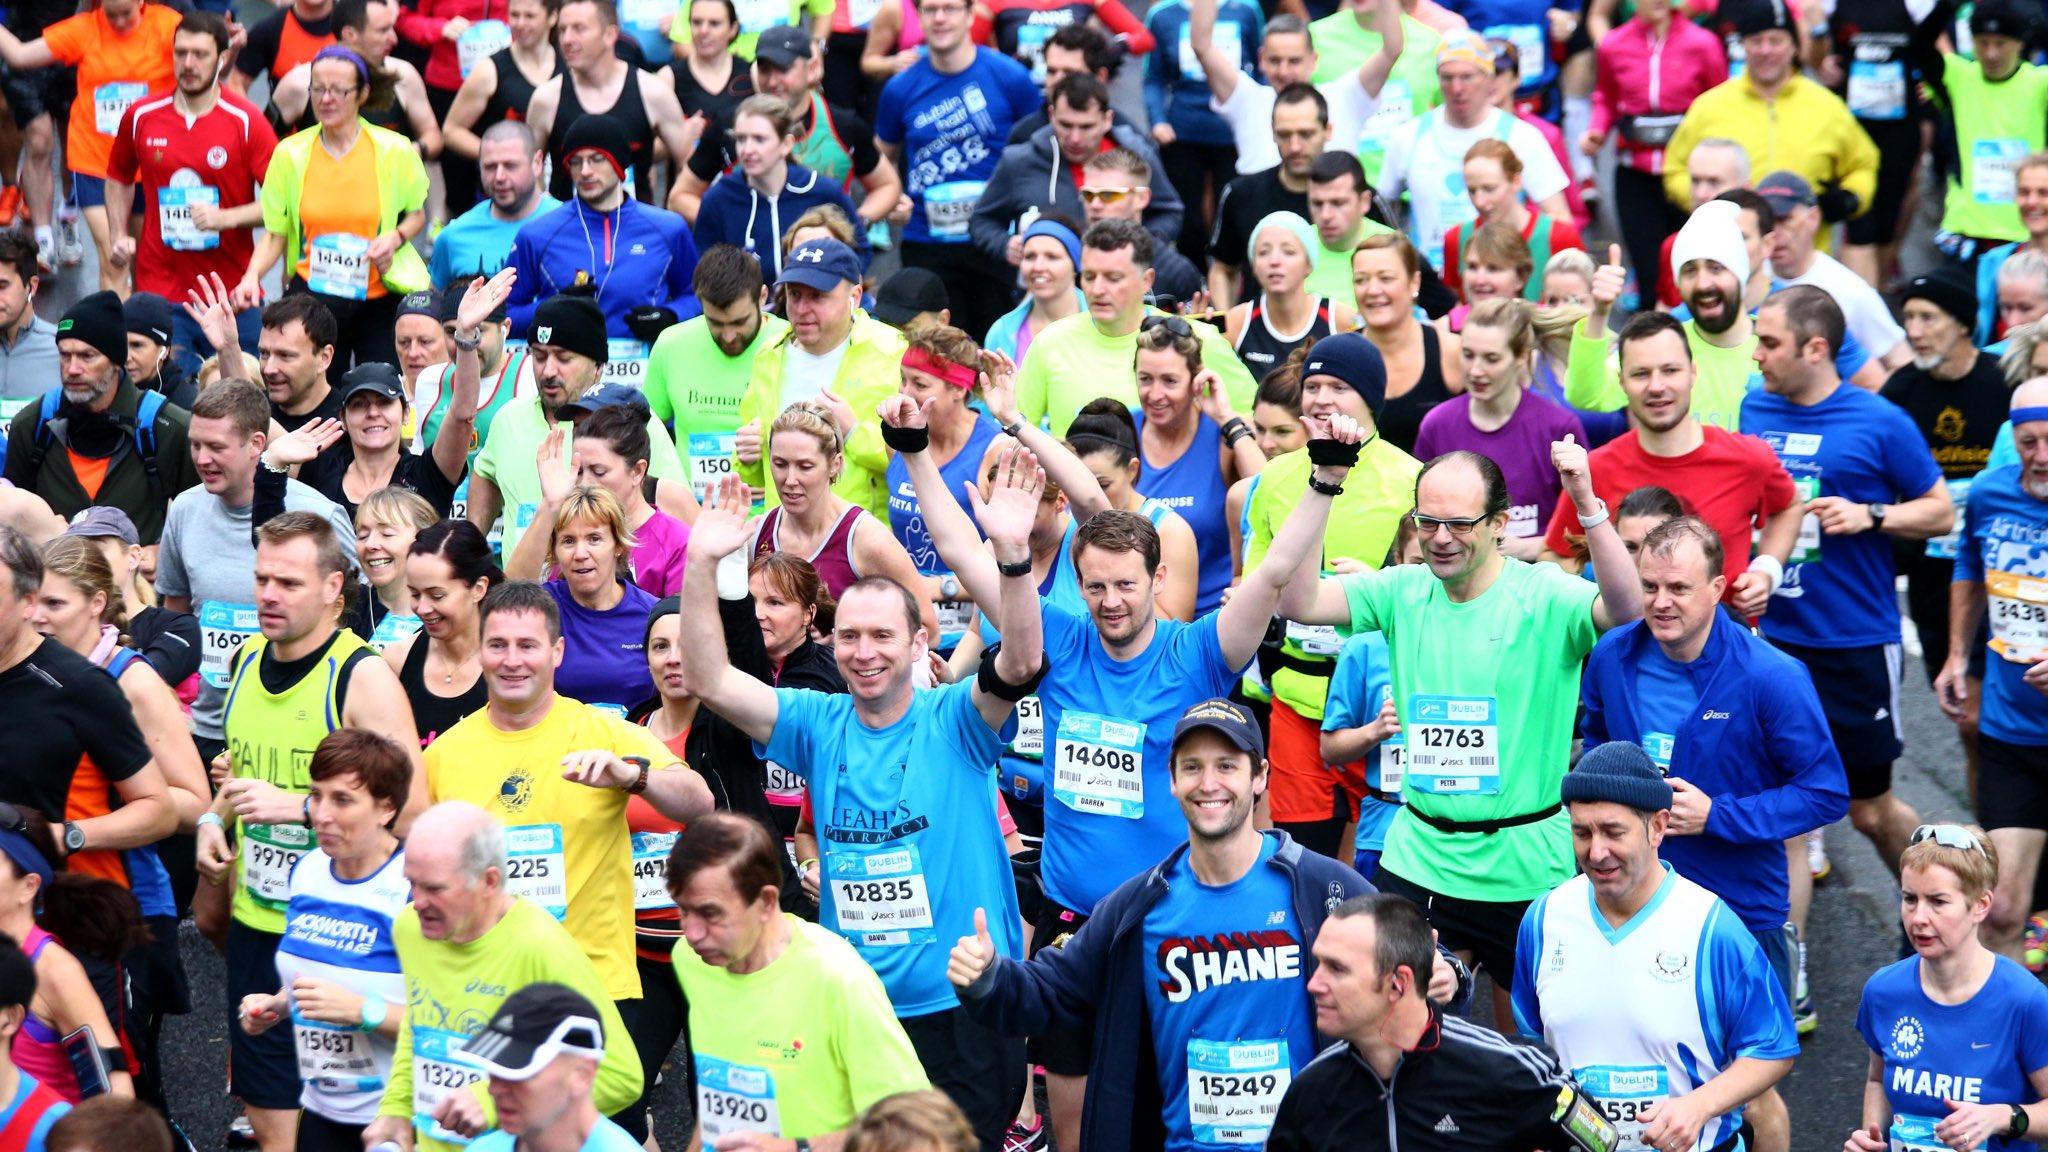 Africans take top prizes at Dublin Marathon